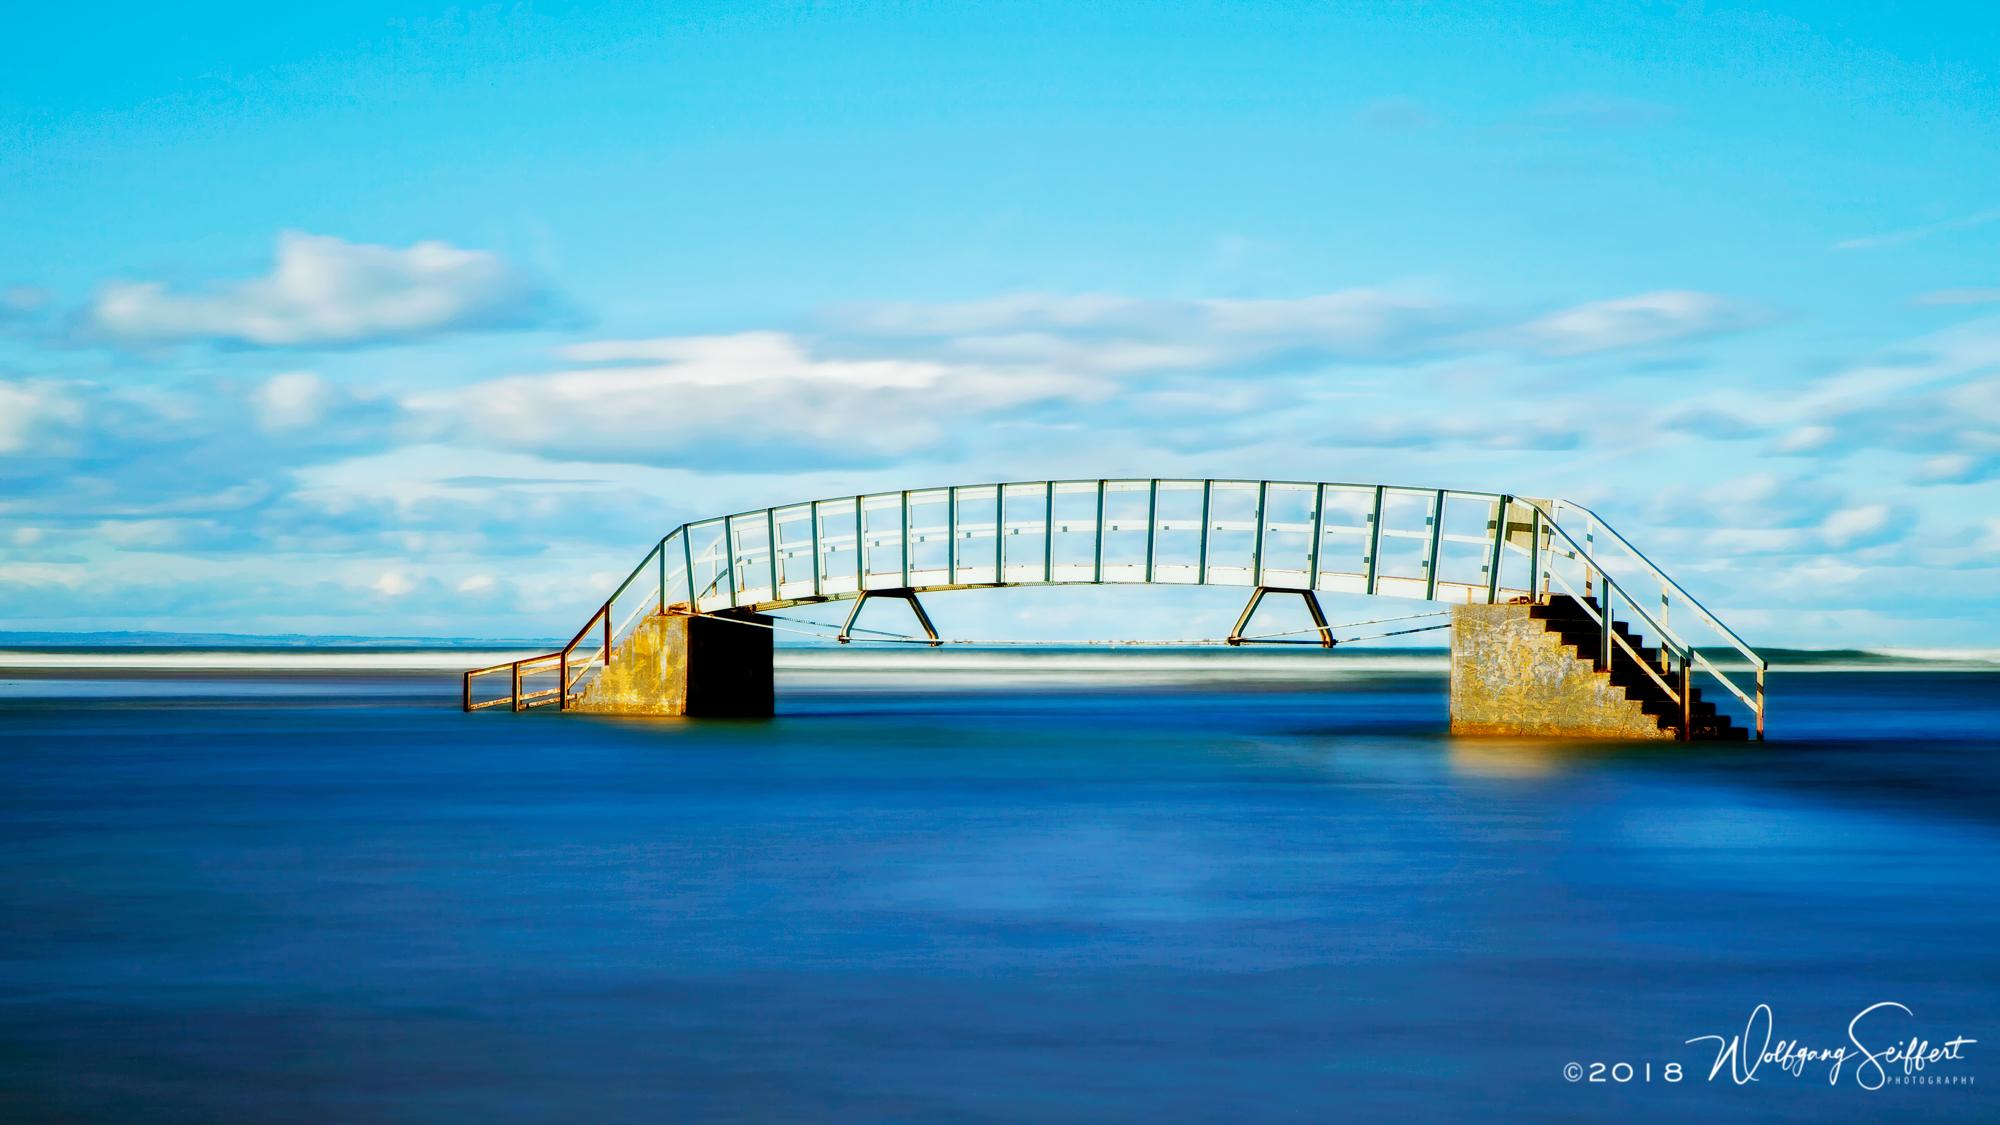 12 The Bridge to Nowhere, United Kingdom